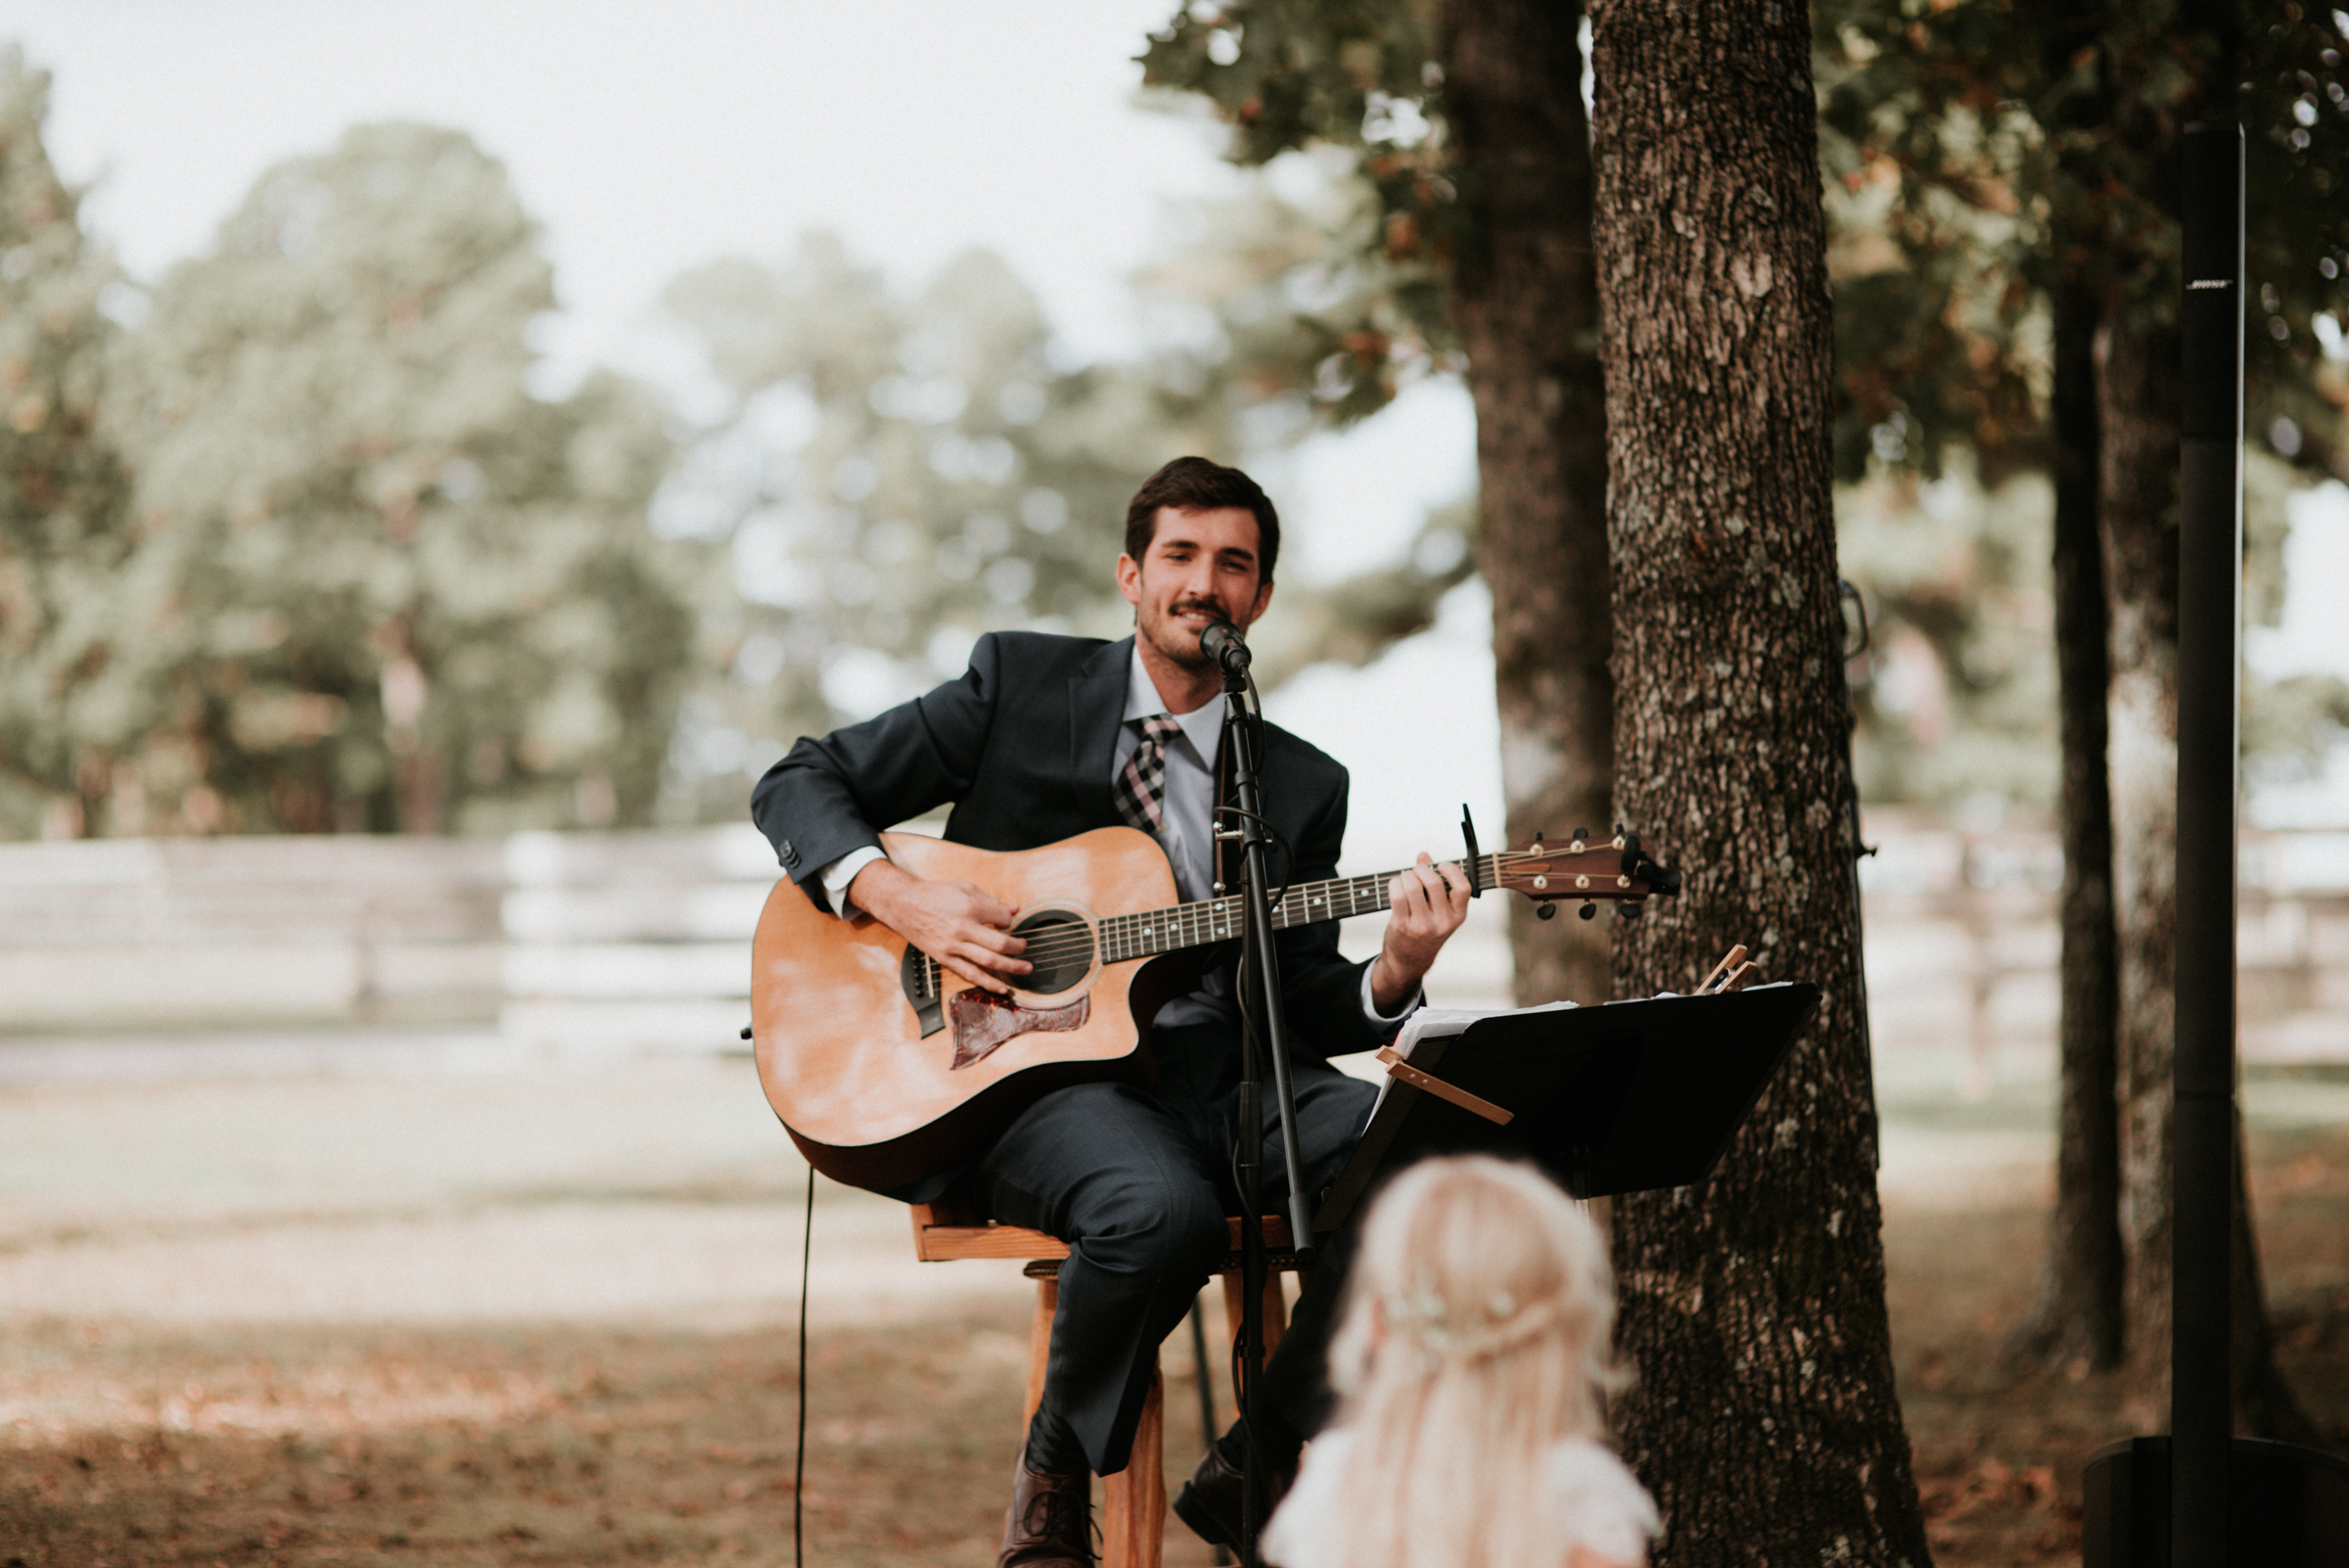 Zach&Rosalie Marion St. Louis Wedding Photographer-5060.jpg